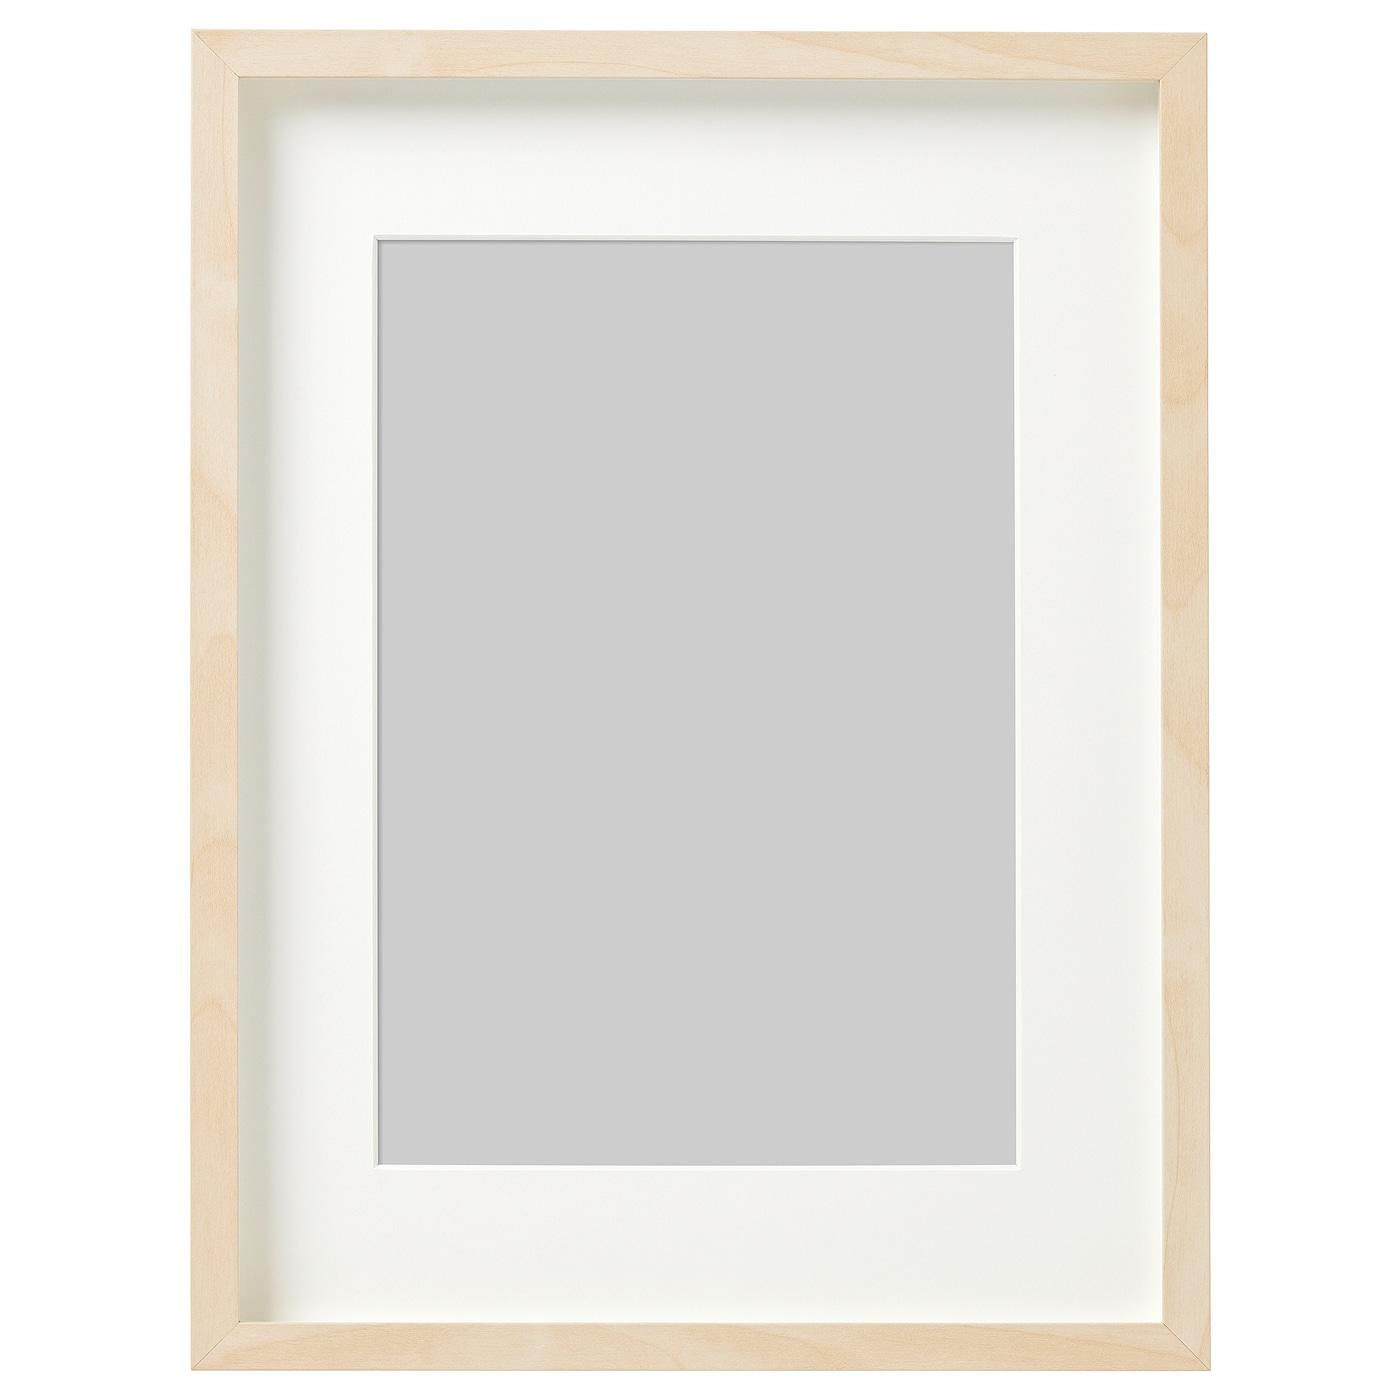 HOVSTA Marco Efecto abedul 30 x 40 cm - IKEA